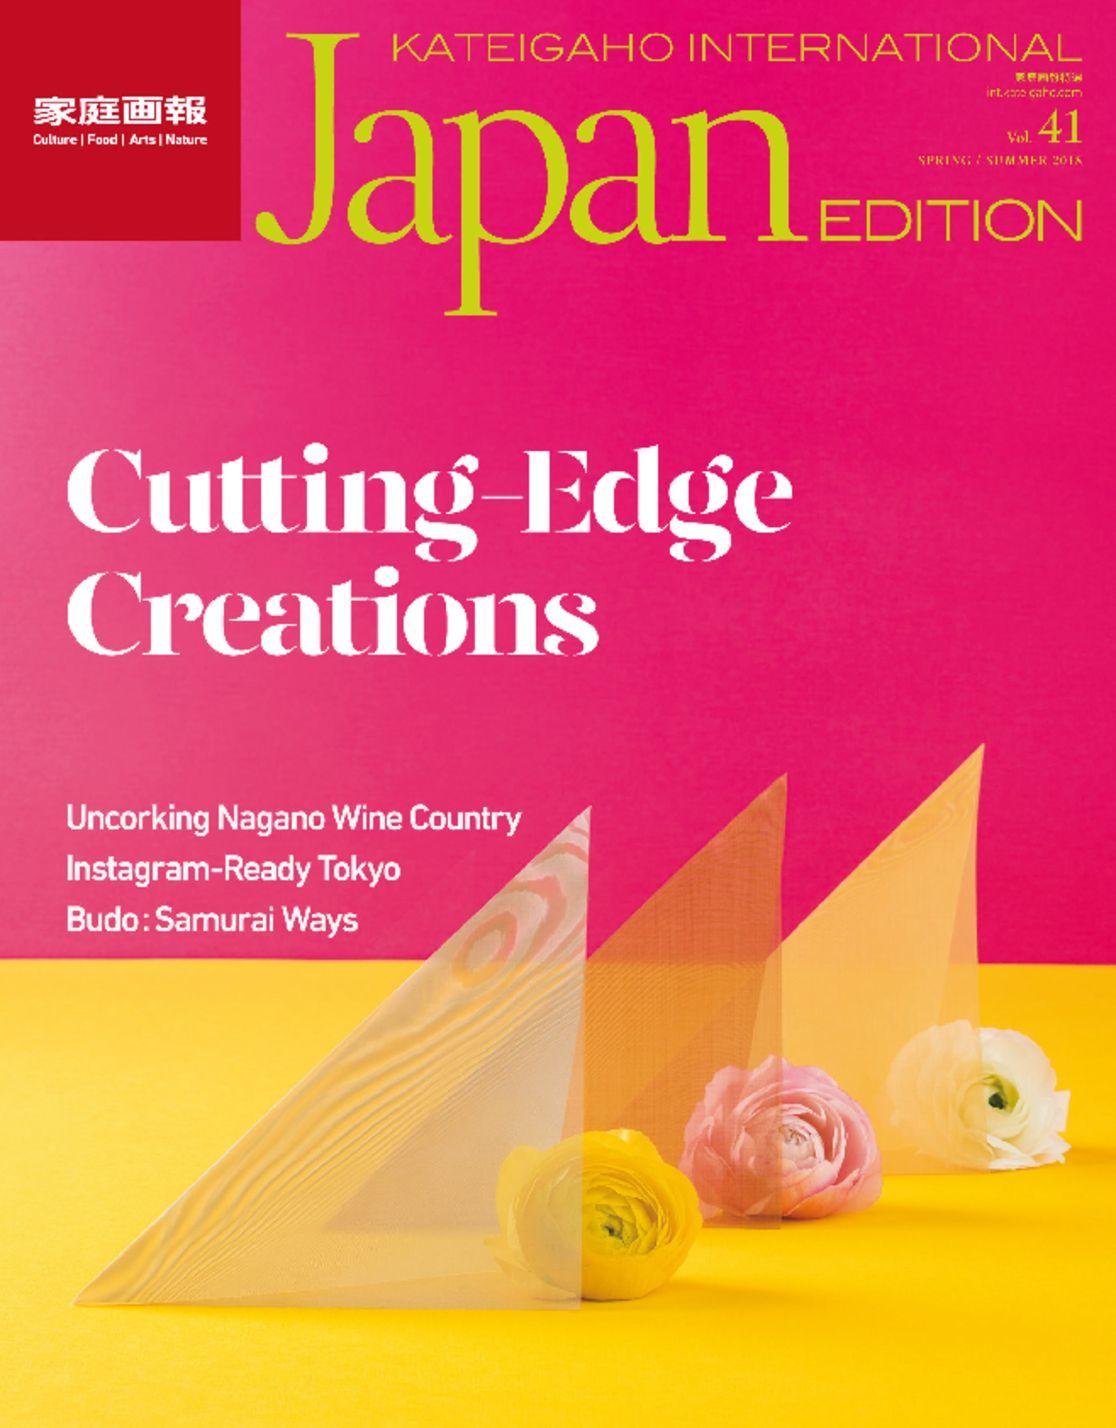 KATEIGAHO INTERNATIONAL JAPAN EDITION Digital